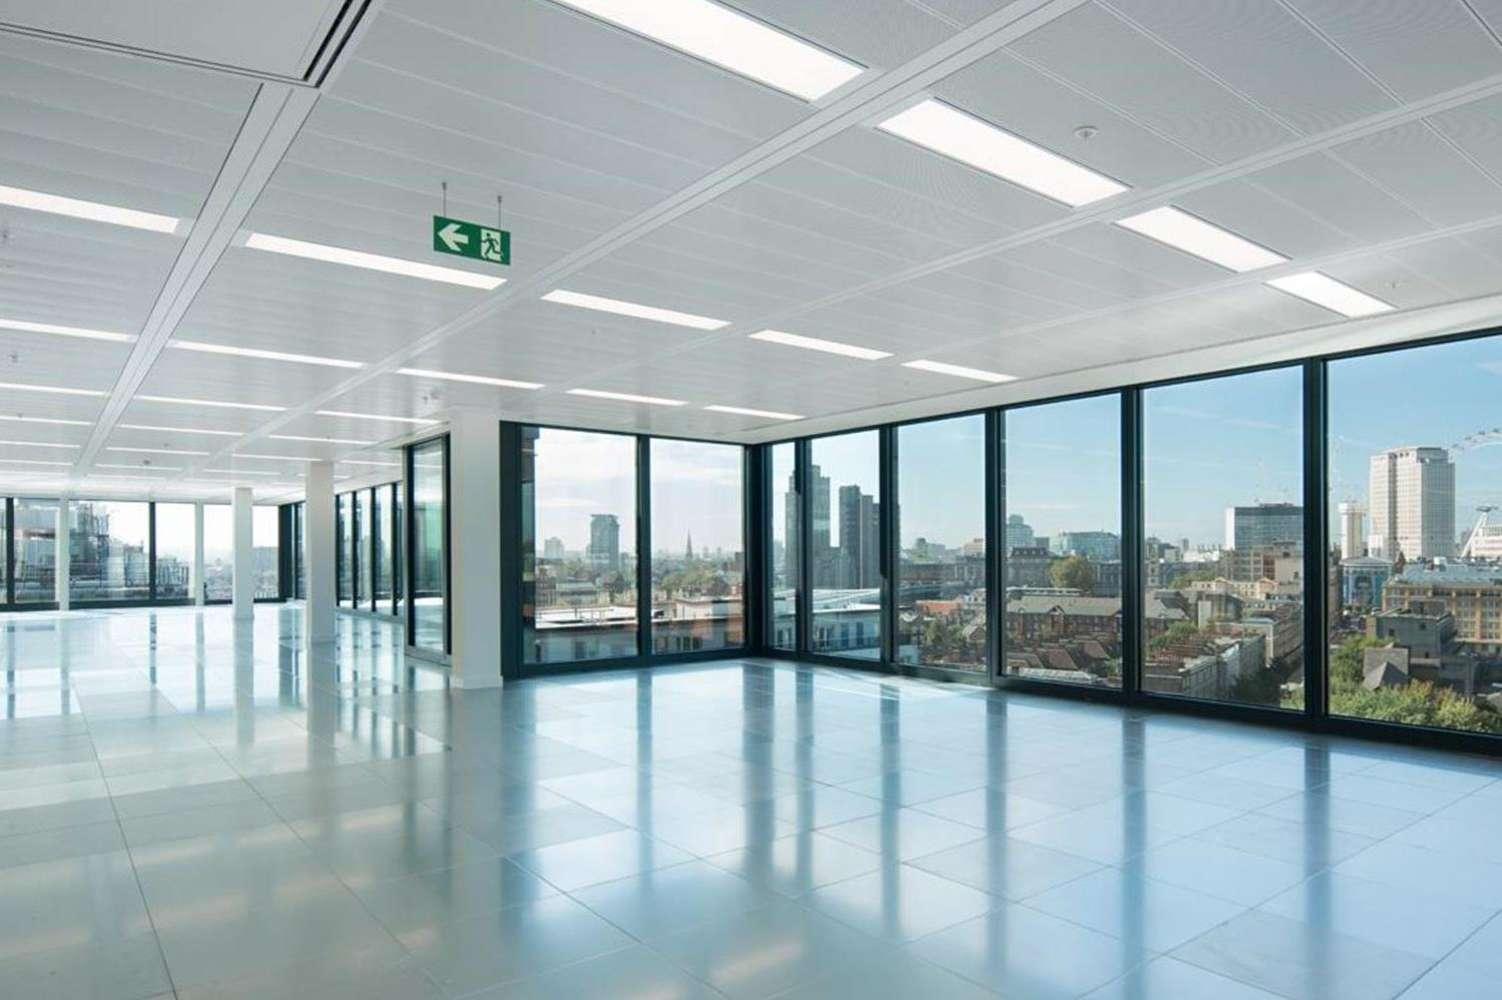 Office London, SE1 9LS - Alto - South Bank Central  - 4